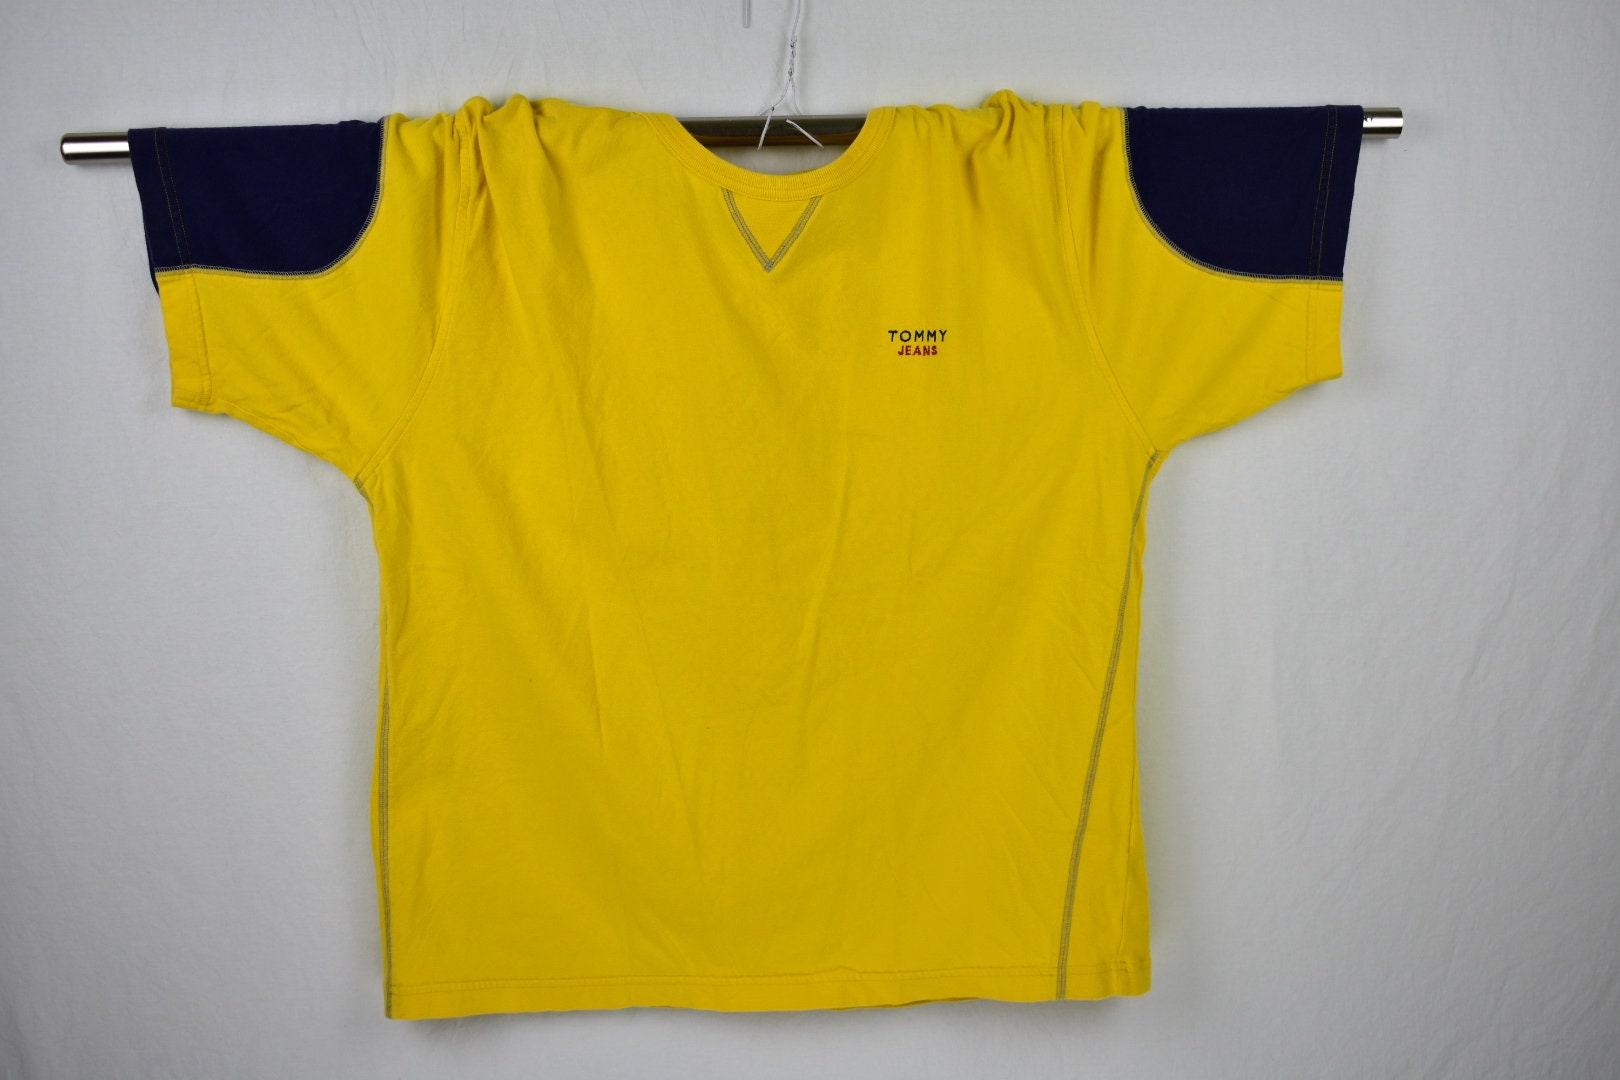 1528e896 Vintage Tommy Hilfiger Jeans Sleeve Color Block Tee Shirt Size | Etsy